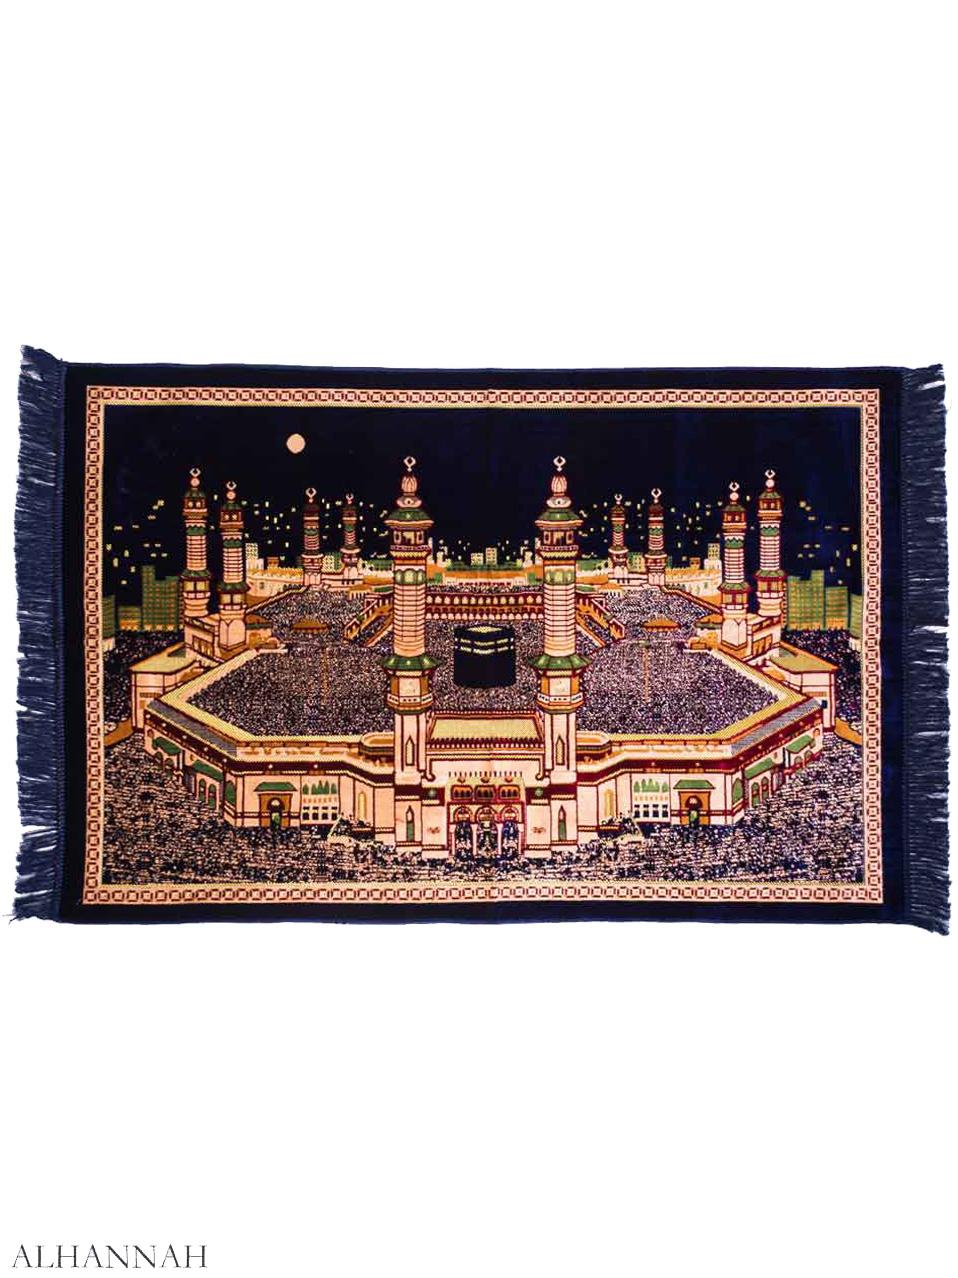 Al-Haram-Mosque-Motif-Large-Prayer-Rug-ii1157